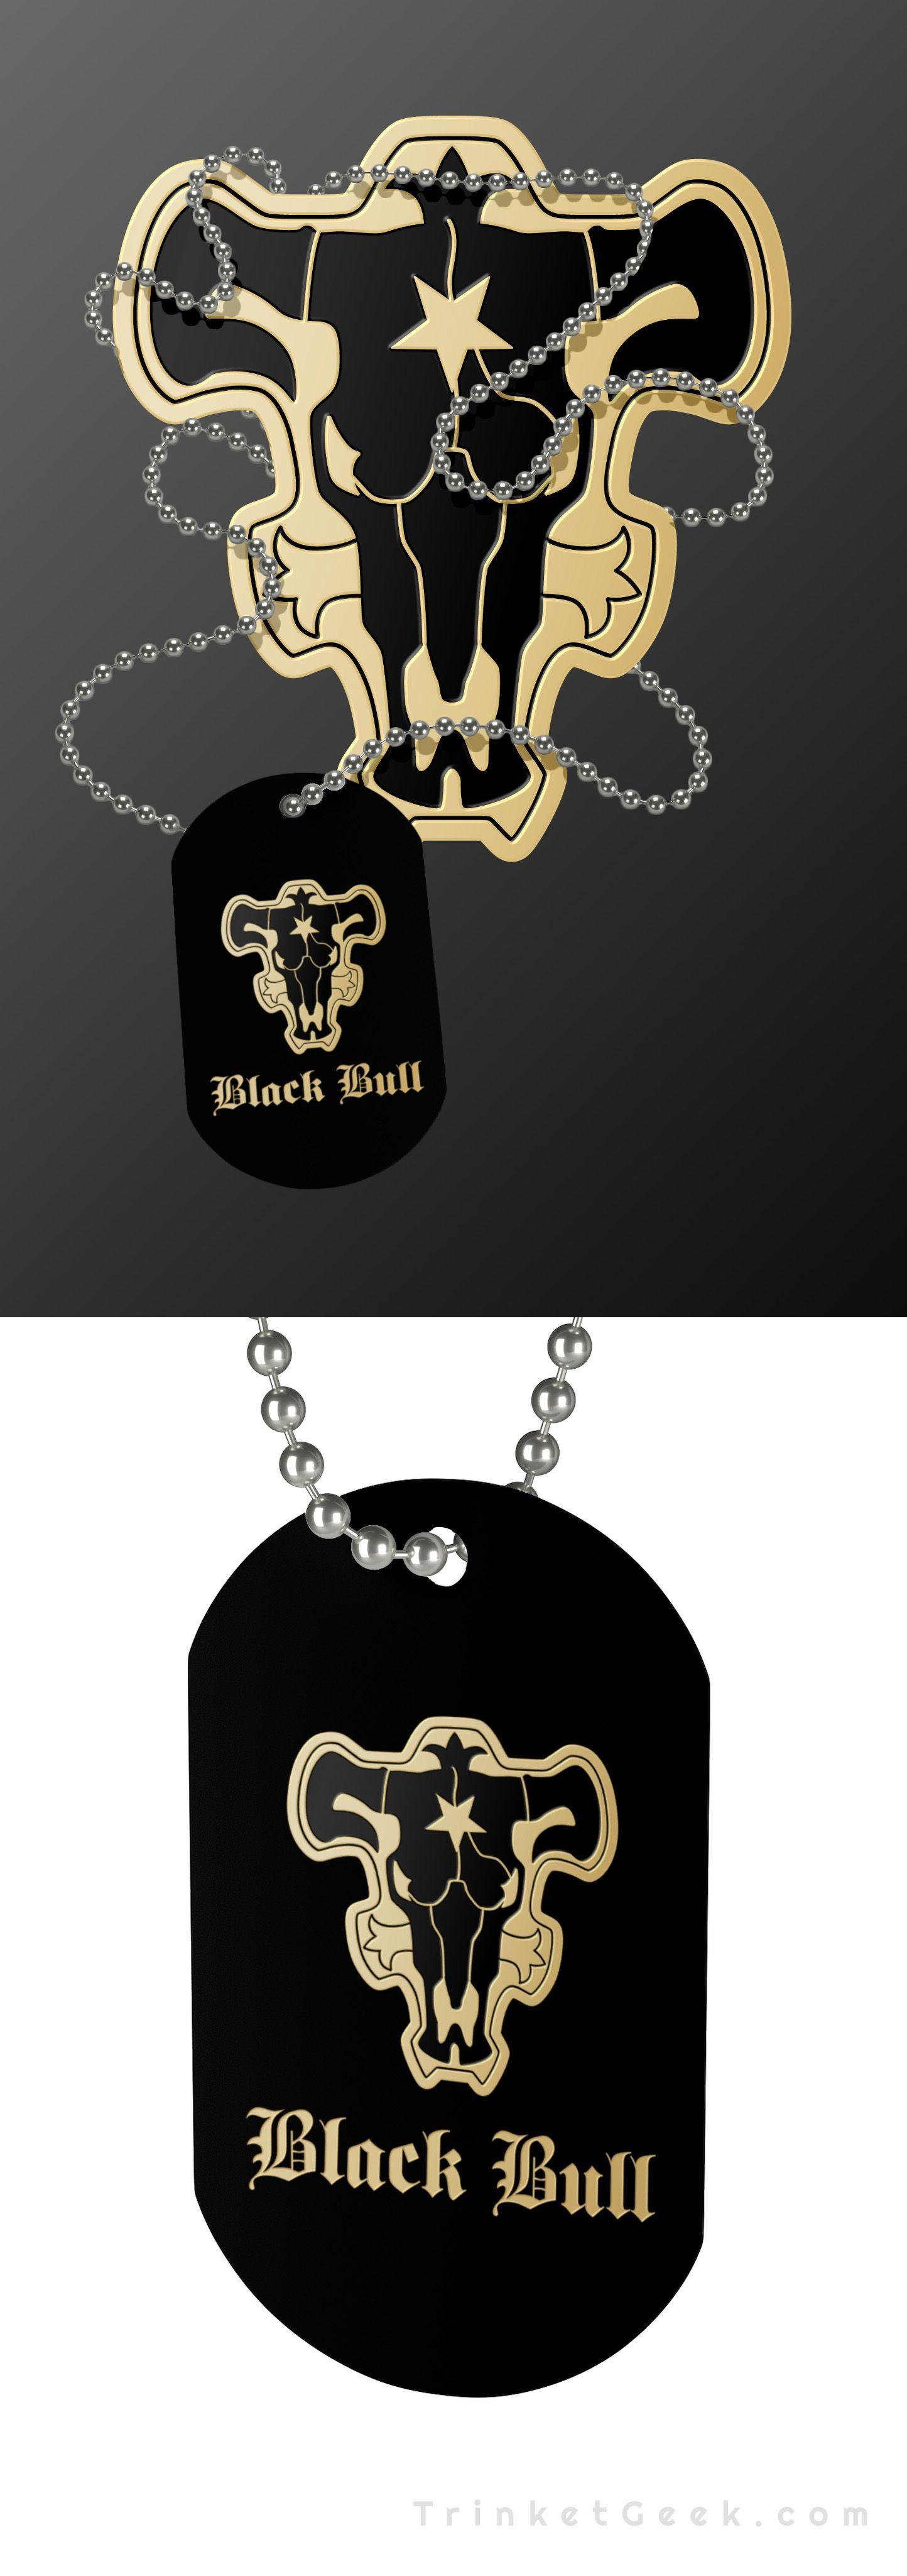 Black clover magic knight squad dog tag necklaces black